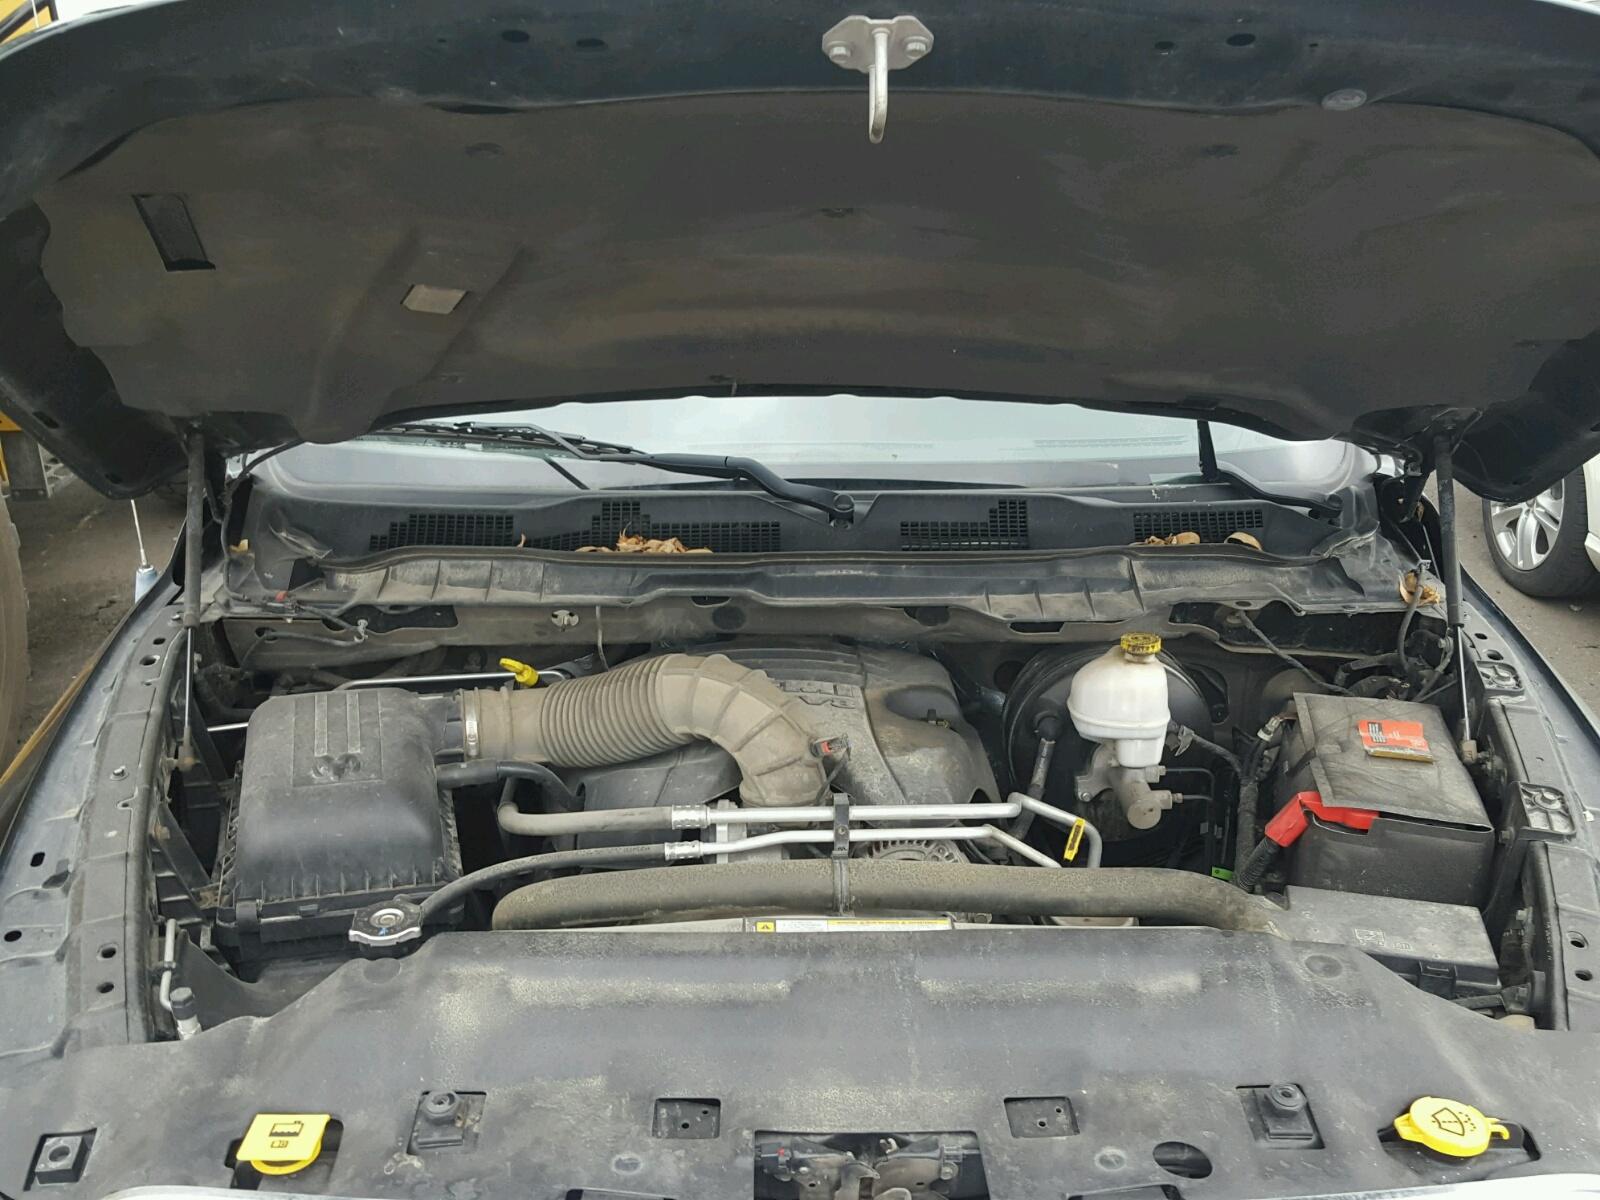 2012 Dodge Ram 1500 L For Sale At Copart Ham Lake Mn Lot 36365008 Engine